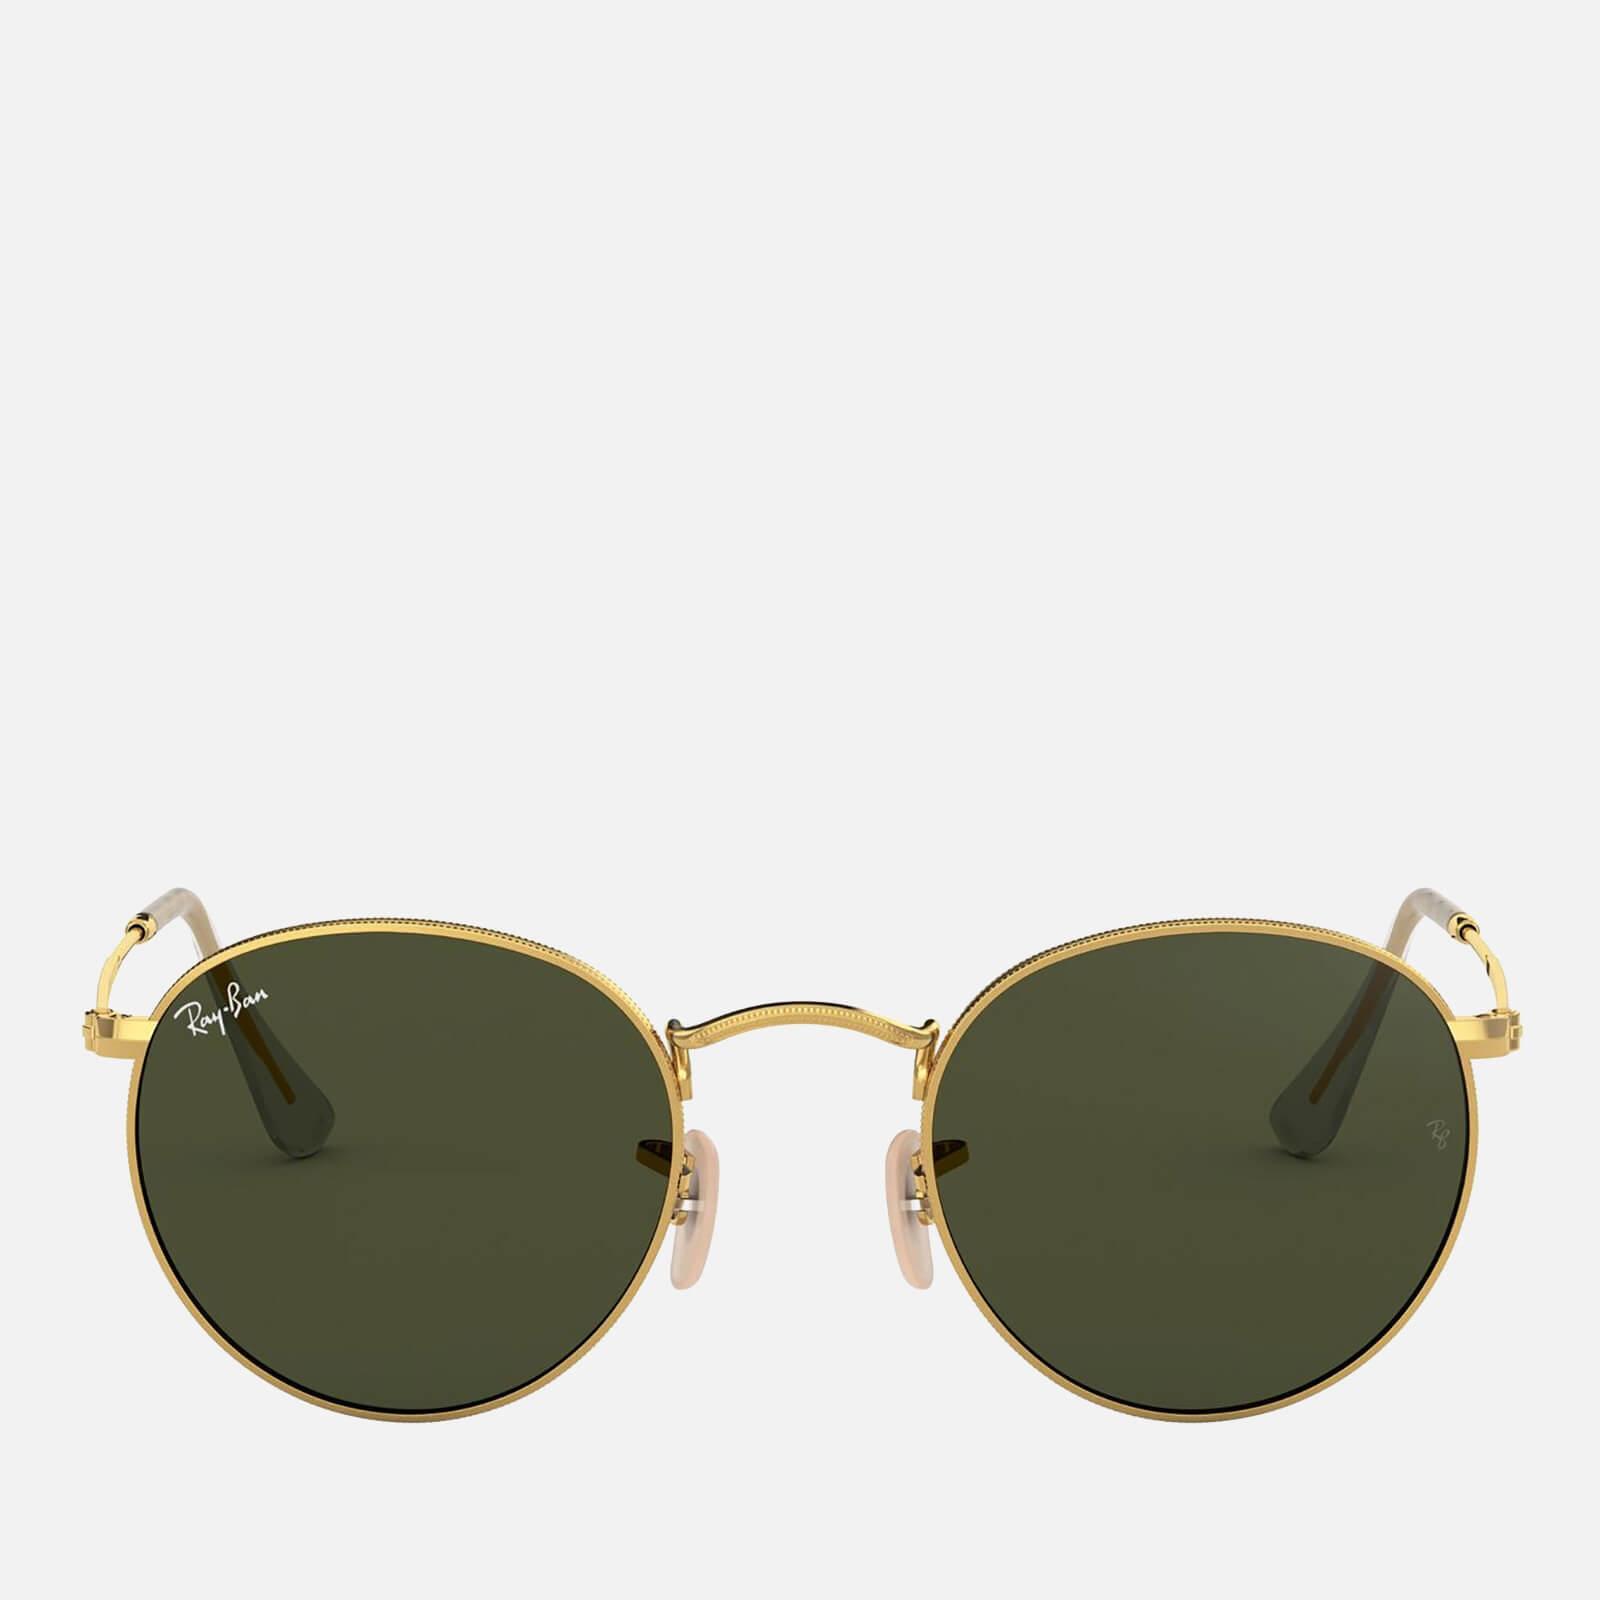 Ray-Ban Women's Round Metal Sunglasses - Gold